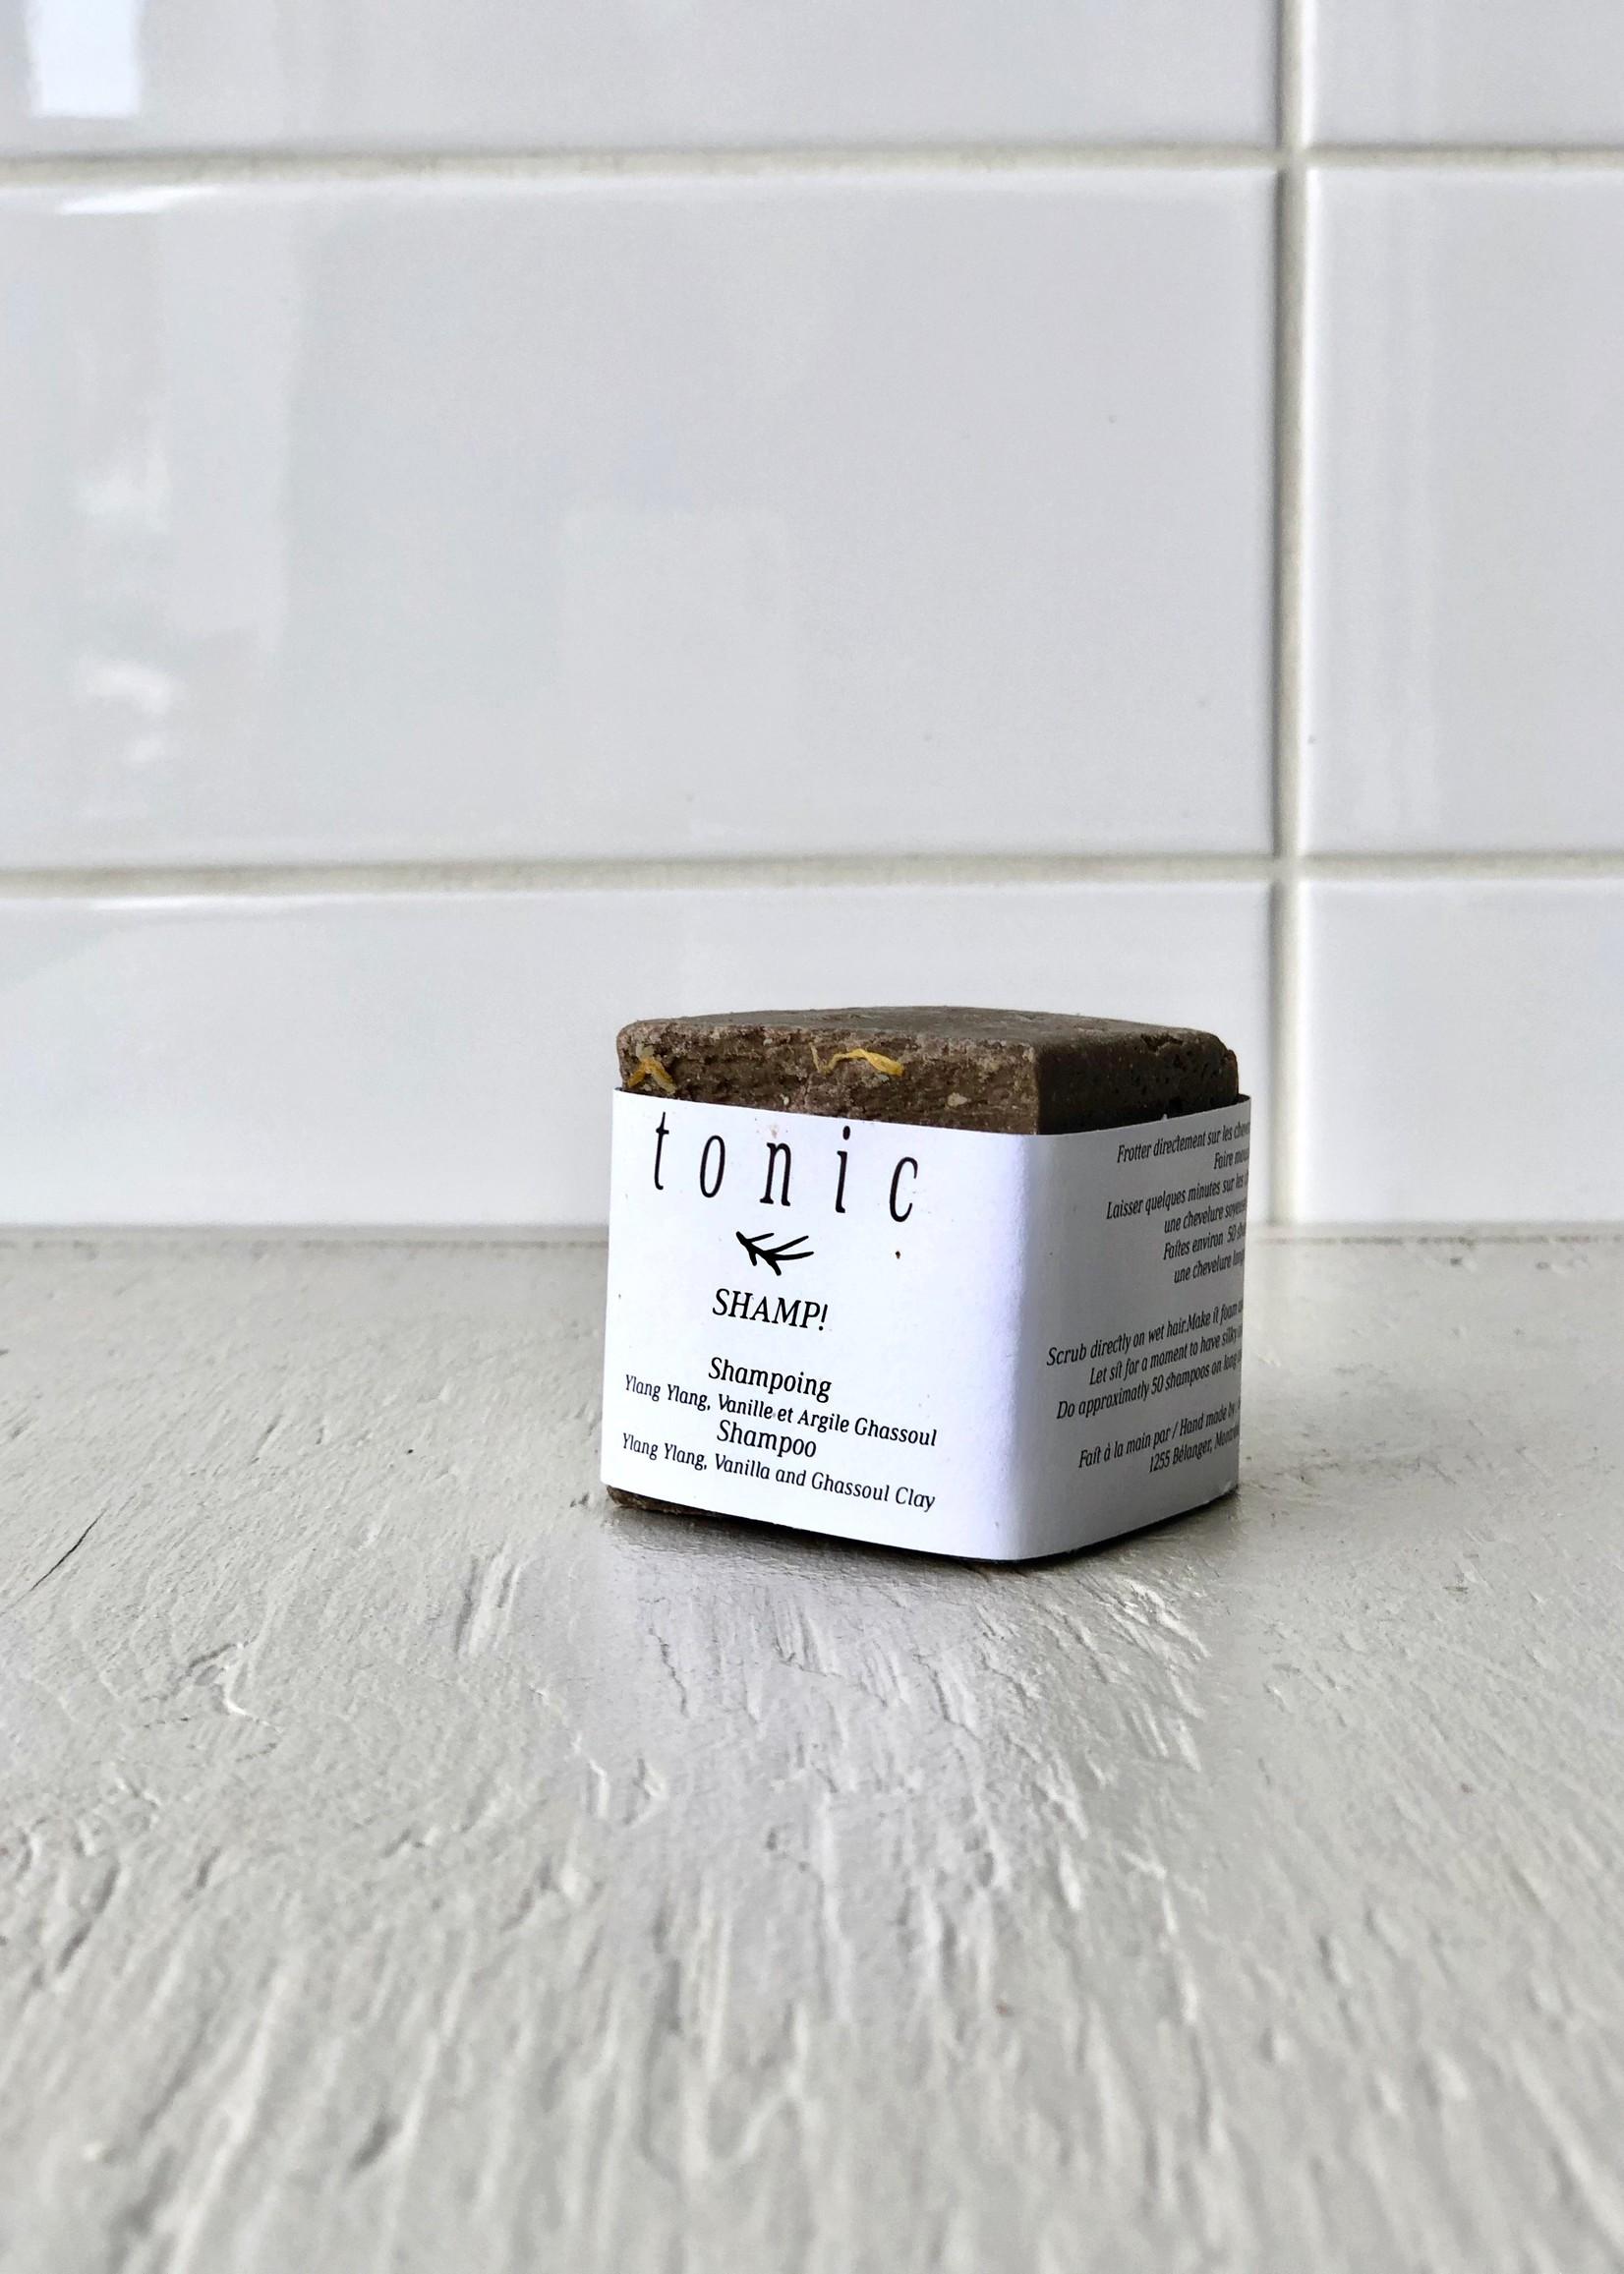 Tonic Shampoing en Barre Tonic